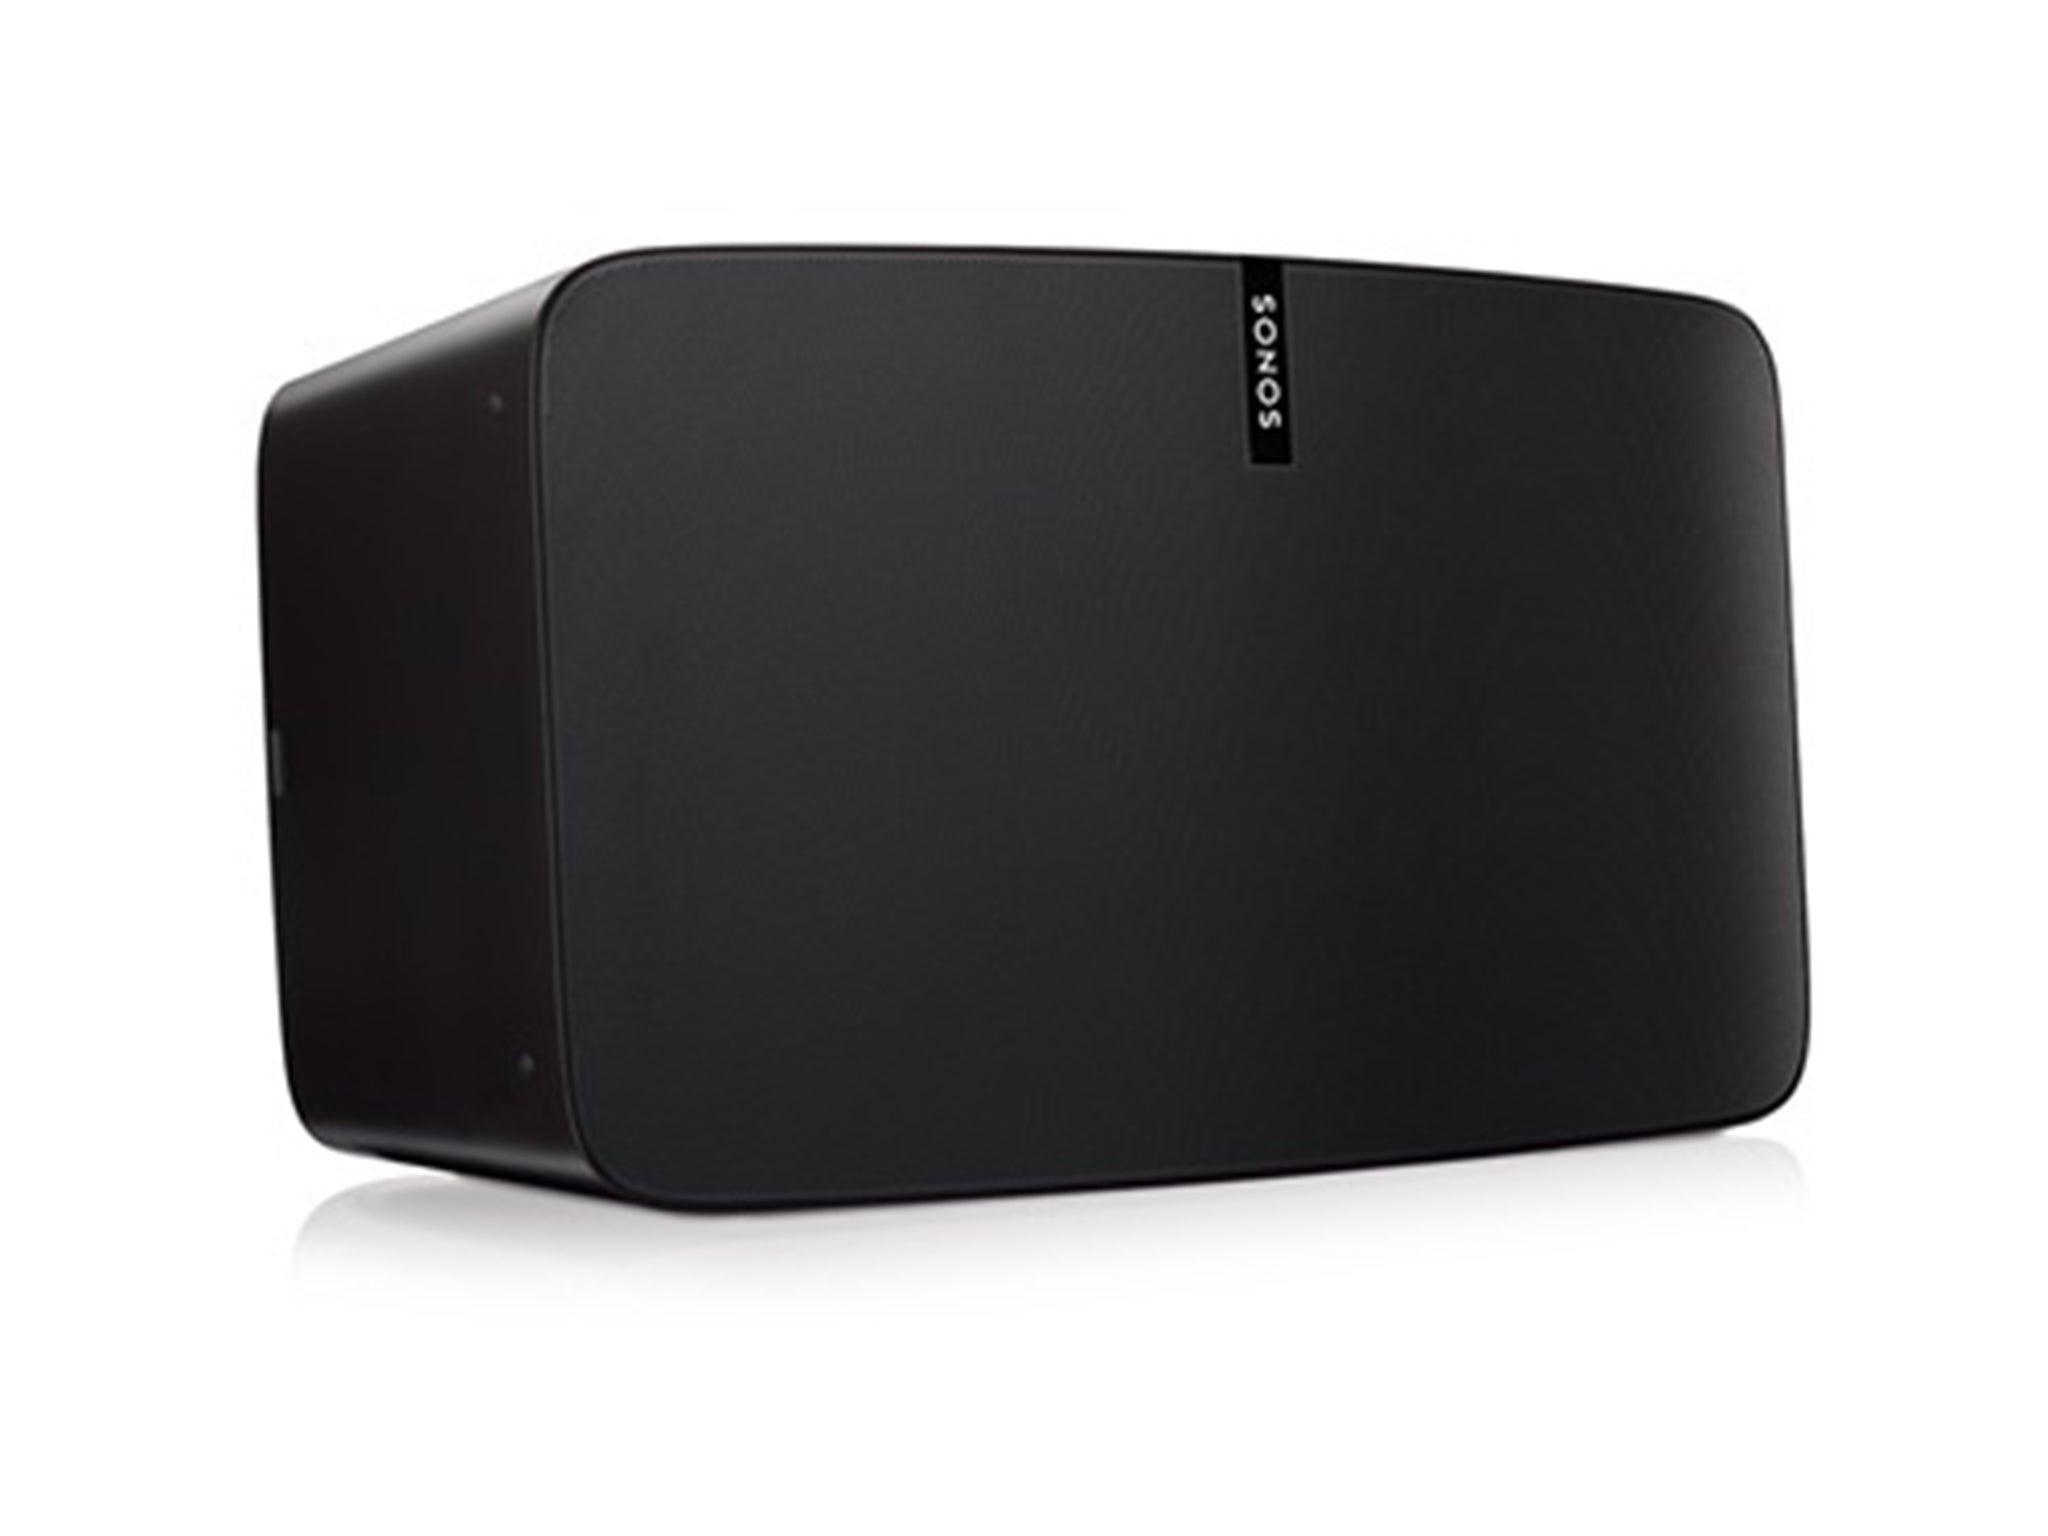 can u play ipod on sonos speaker